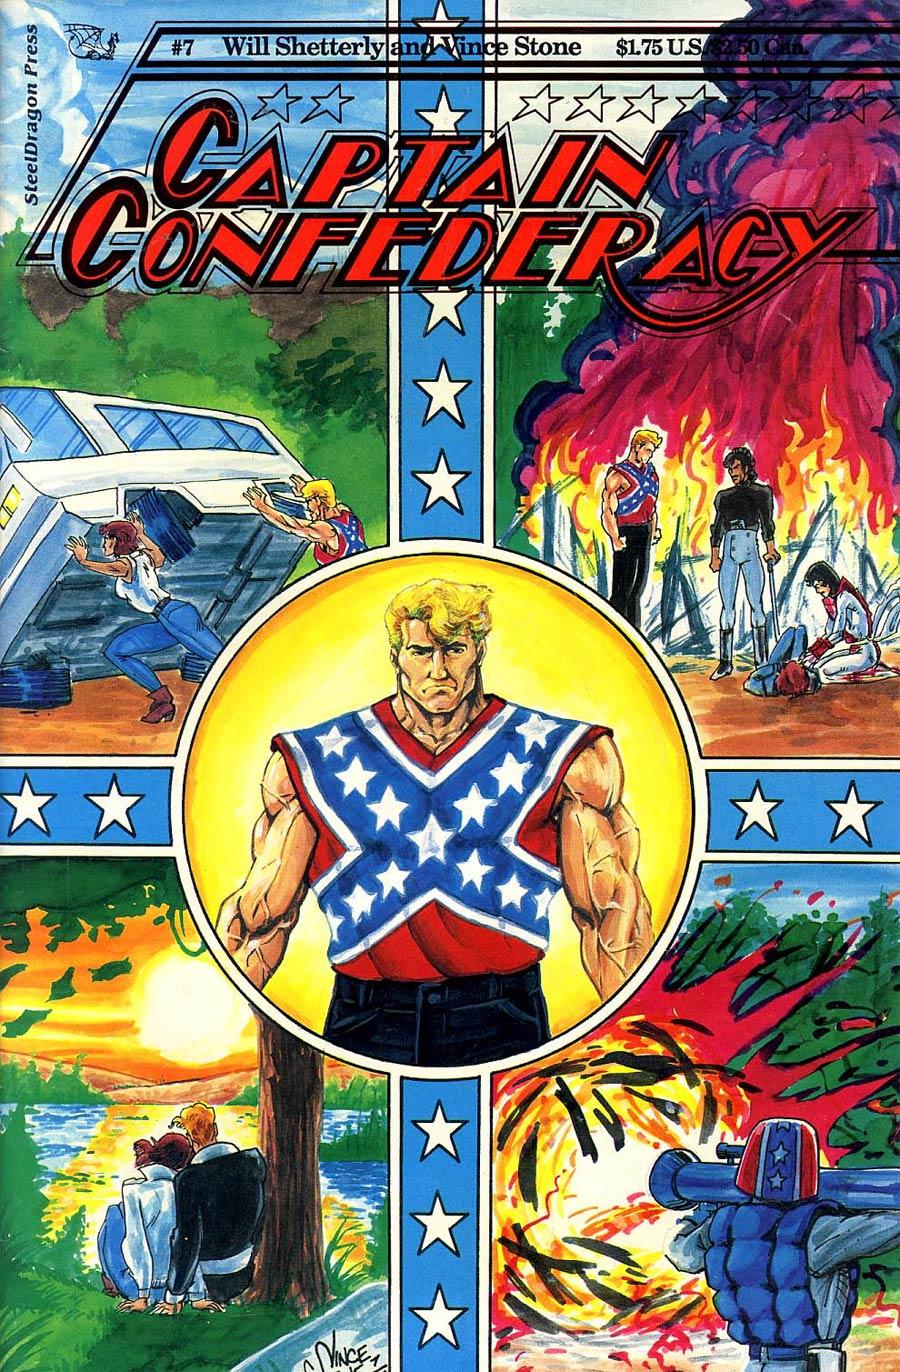 Captain Confederacy #7